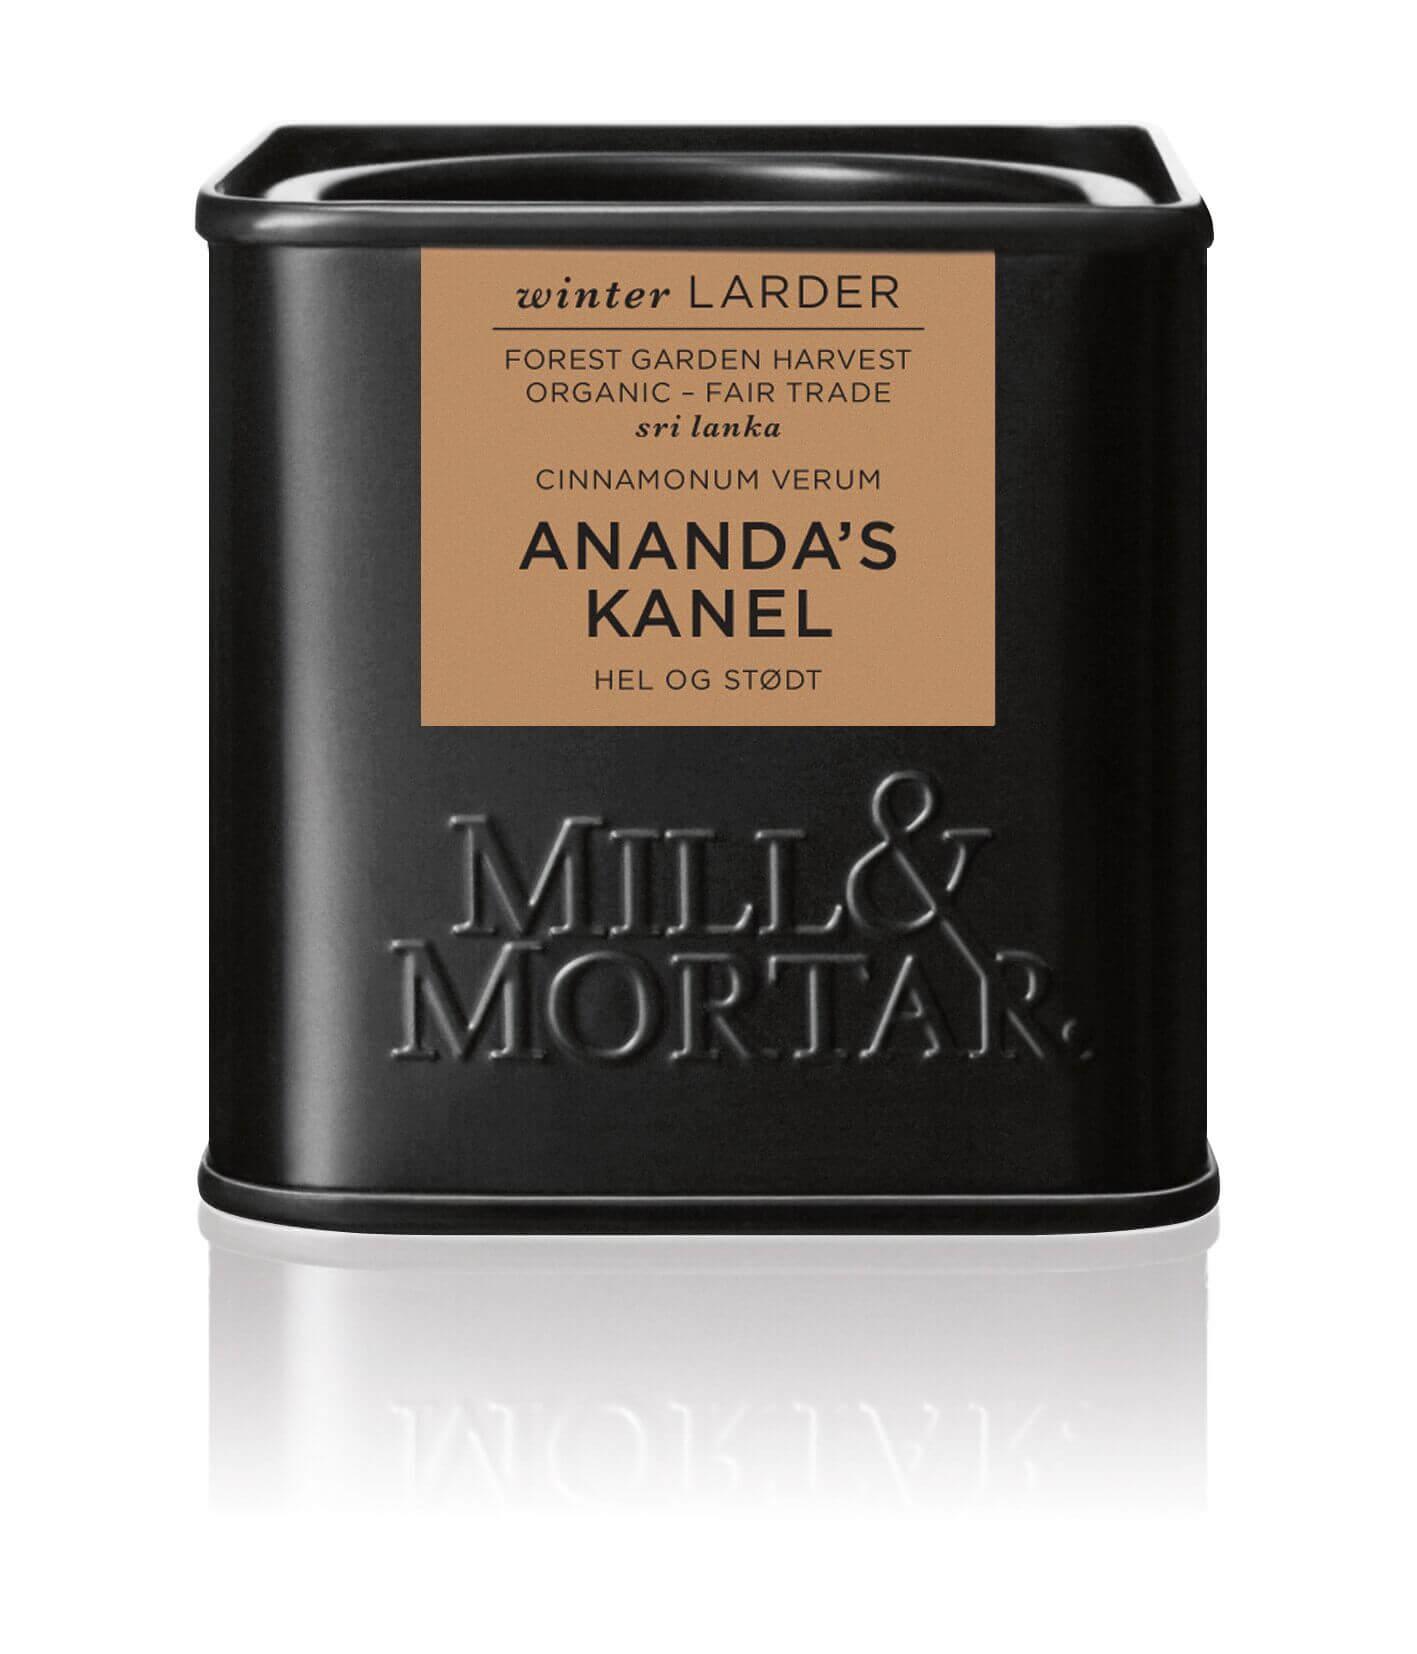 Mill & Mortar Anandas kanel hel & stødt ØKO 45 g